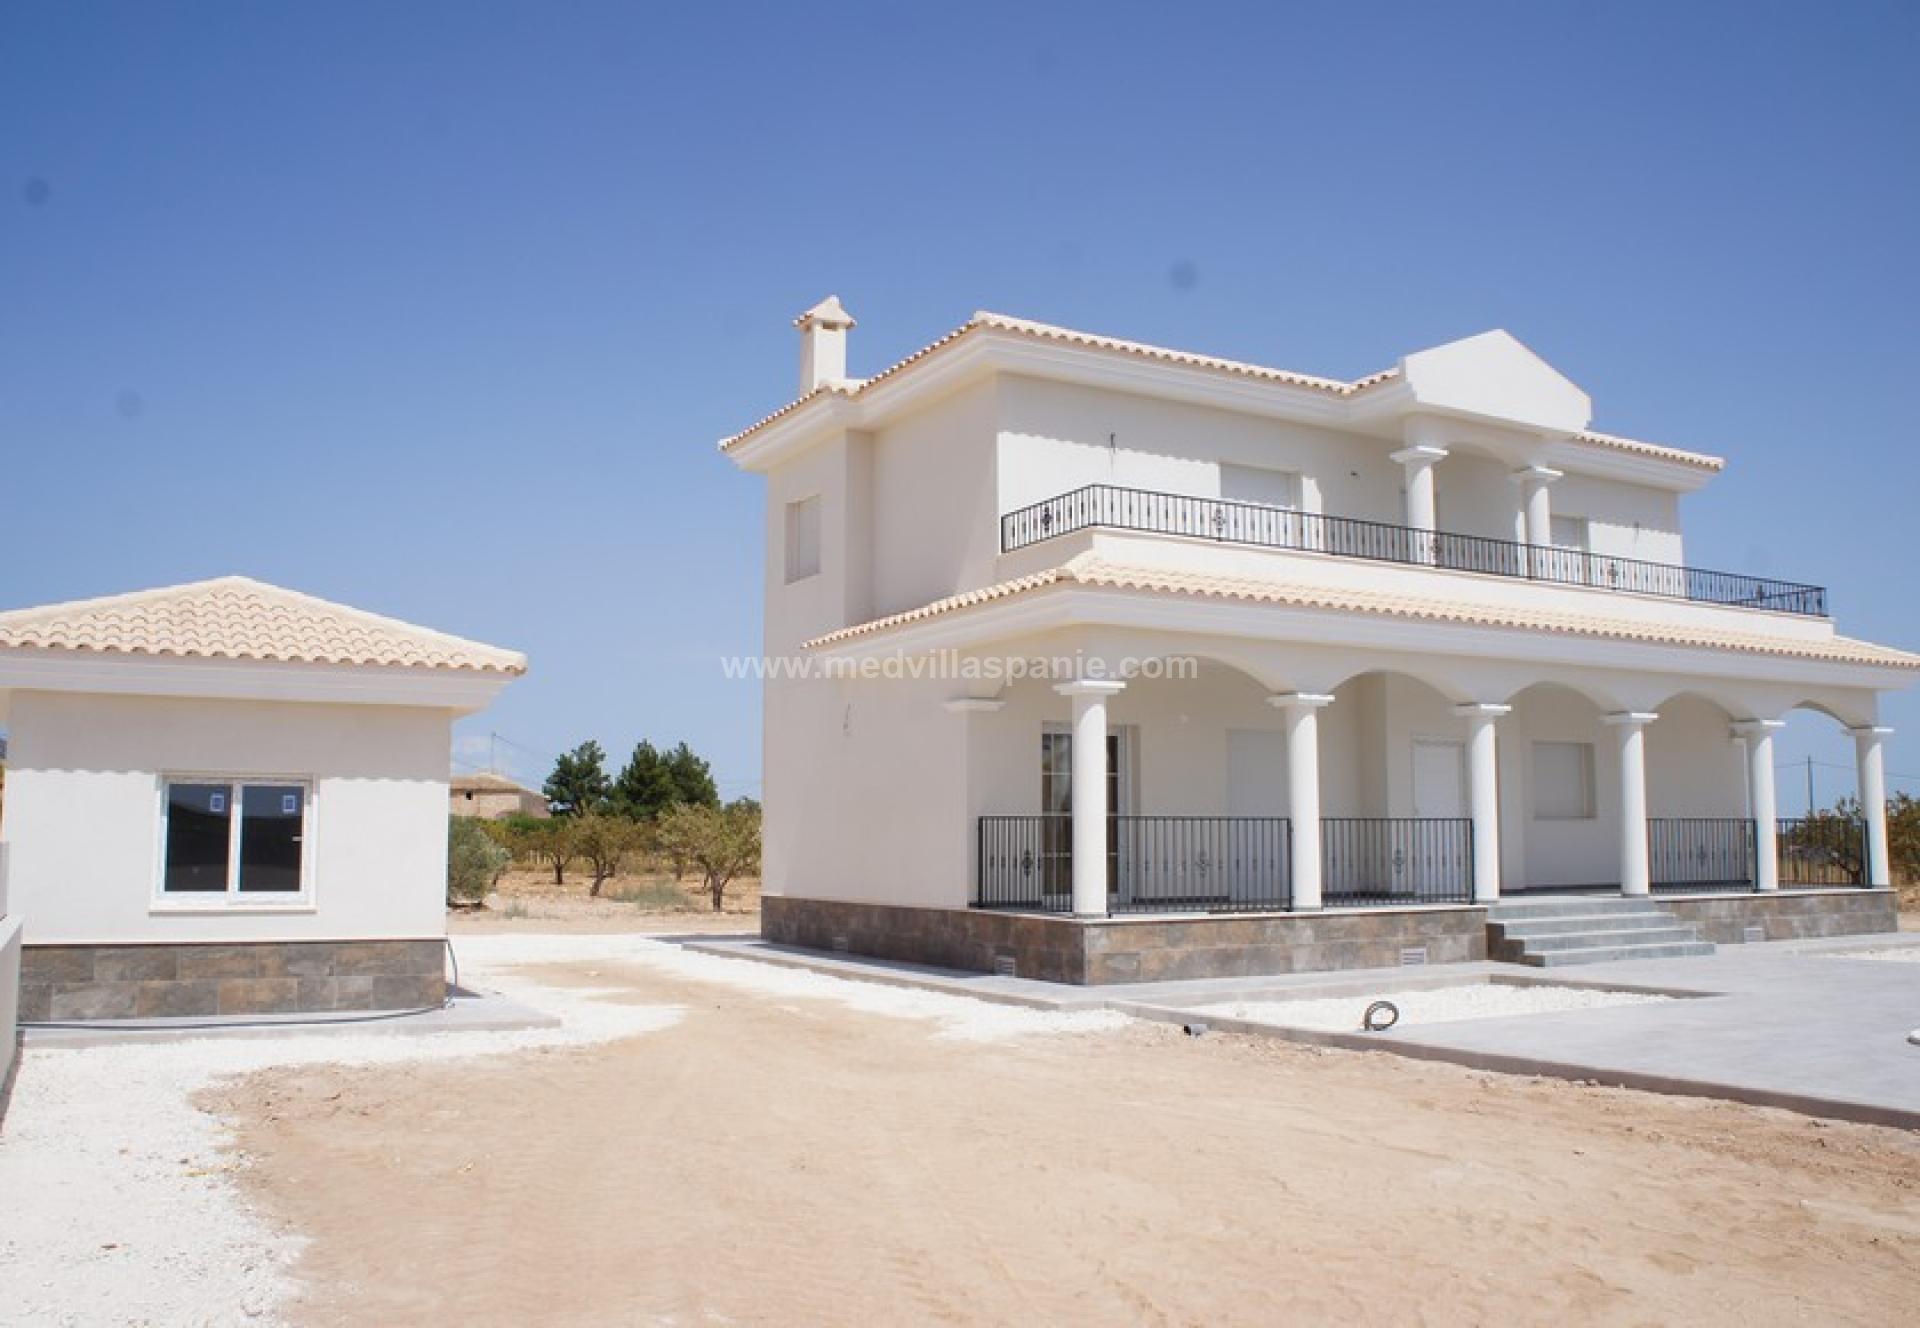 Bouw uw eigen villa in Alicante, Costa Blanca in Medvilla Spanje